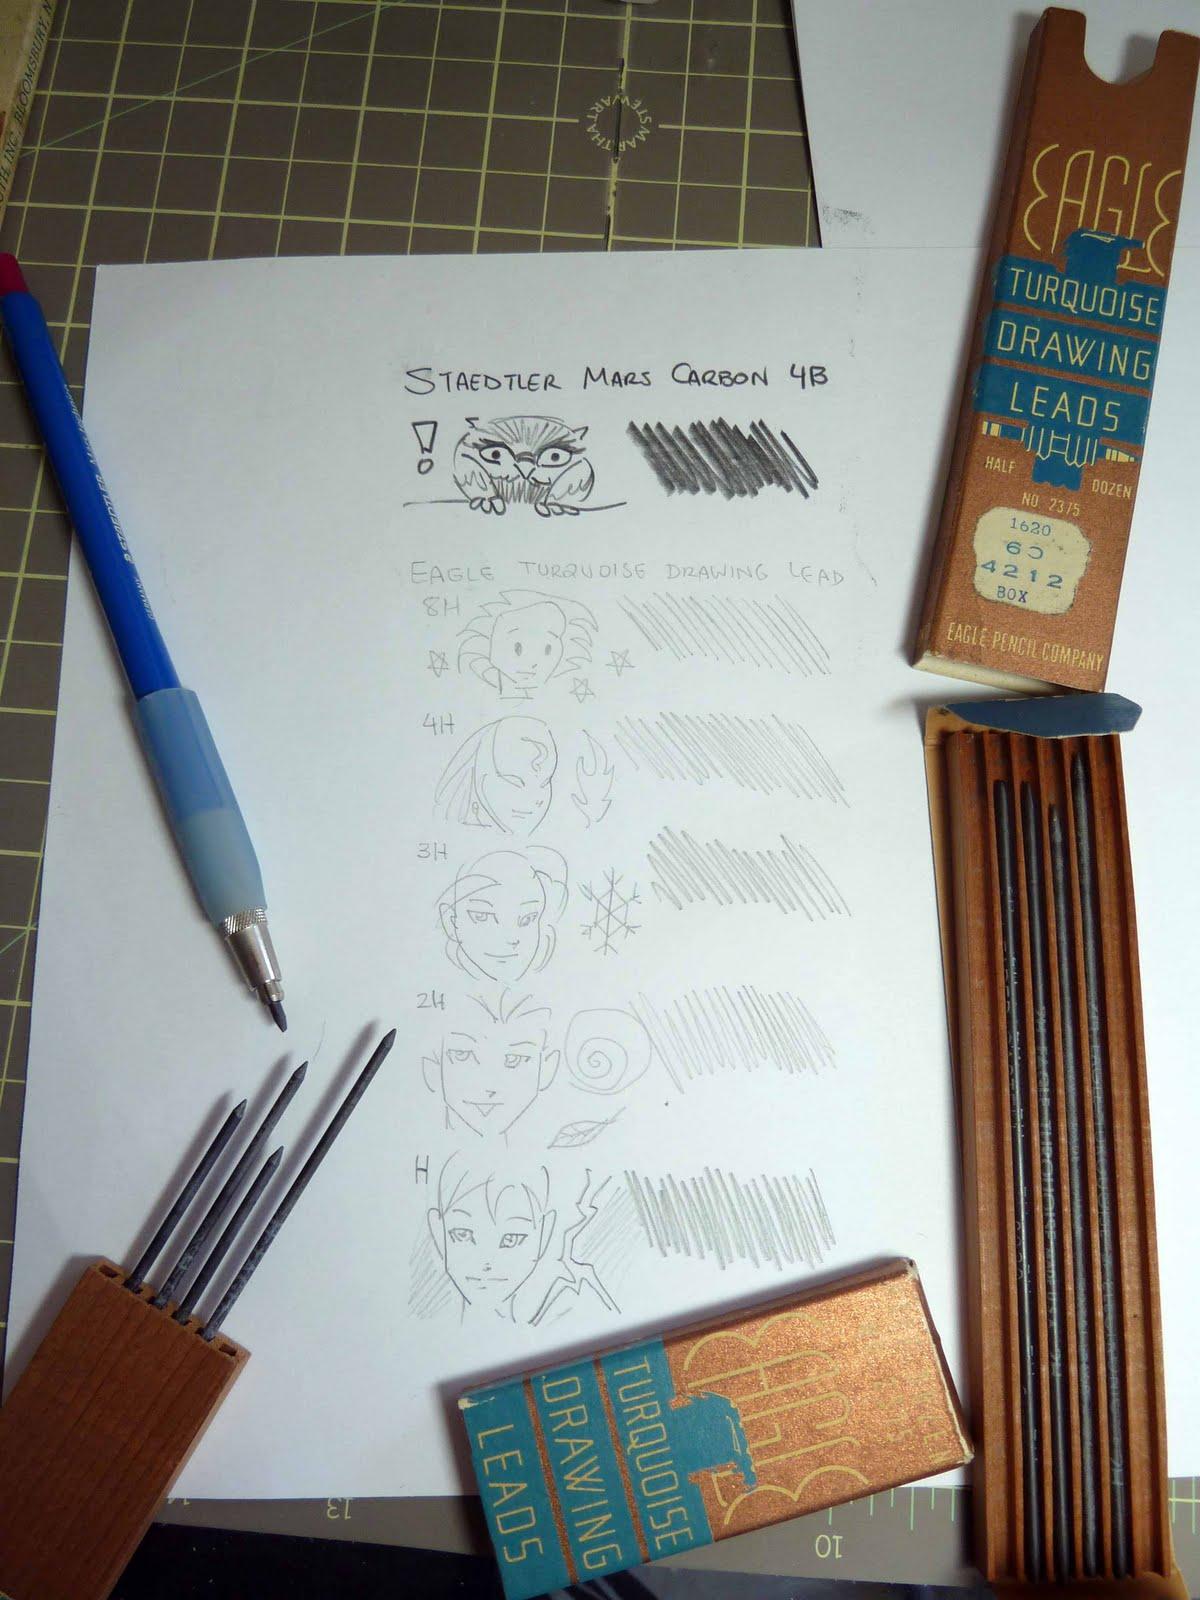 Turquoise Drawing Leads Dozen B